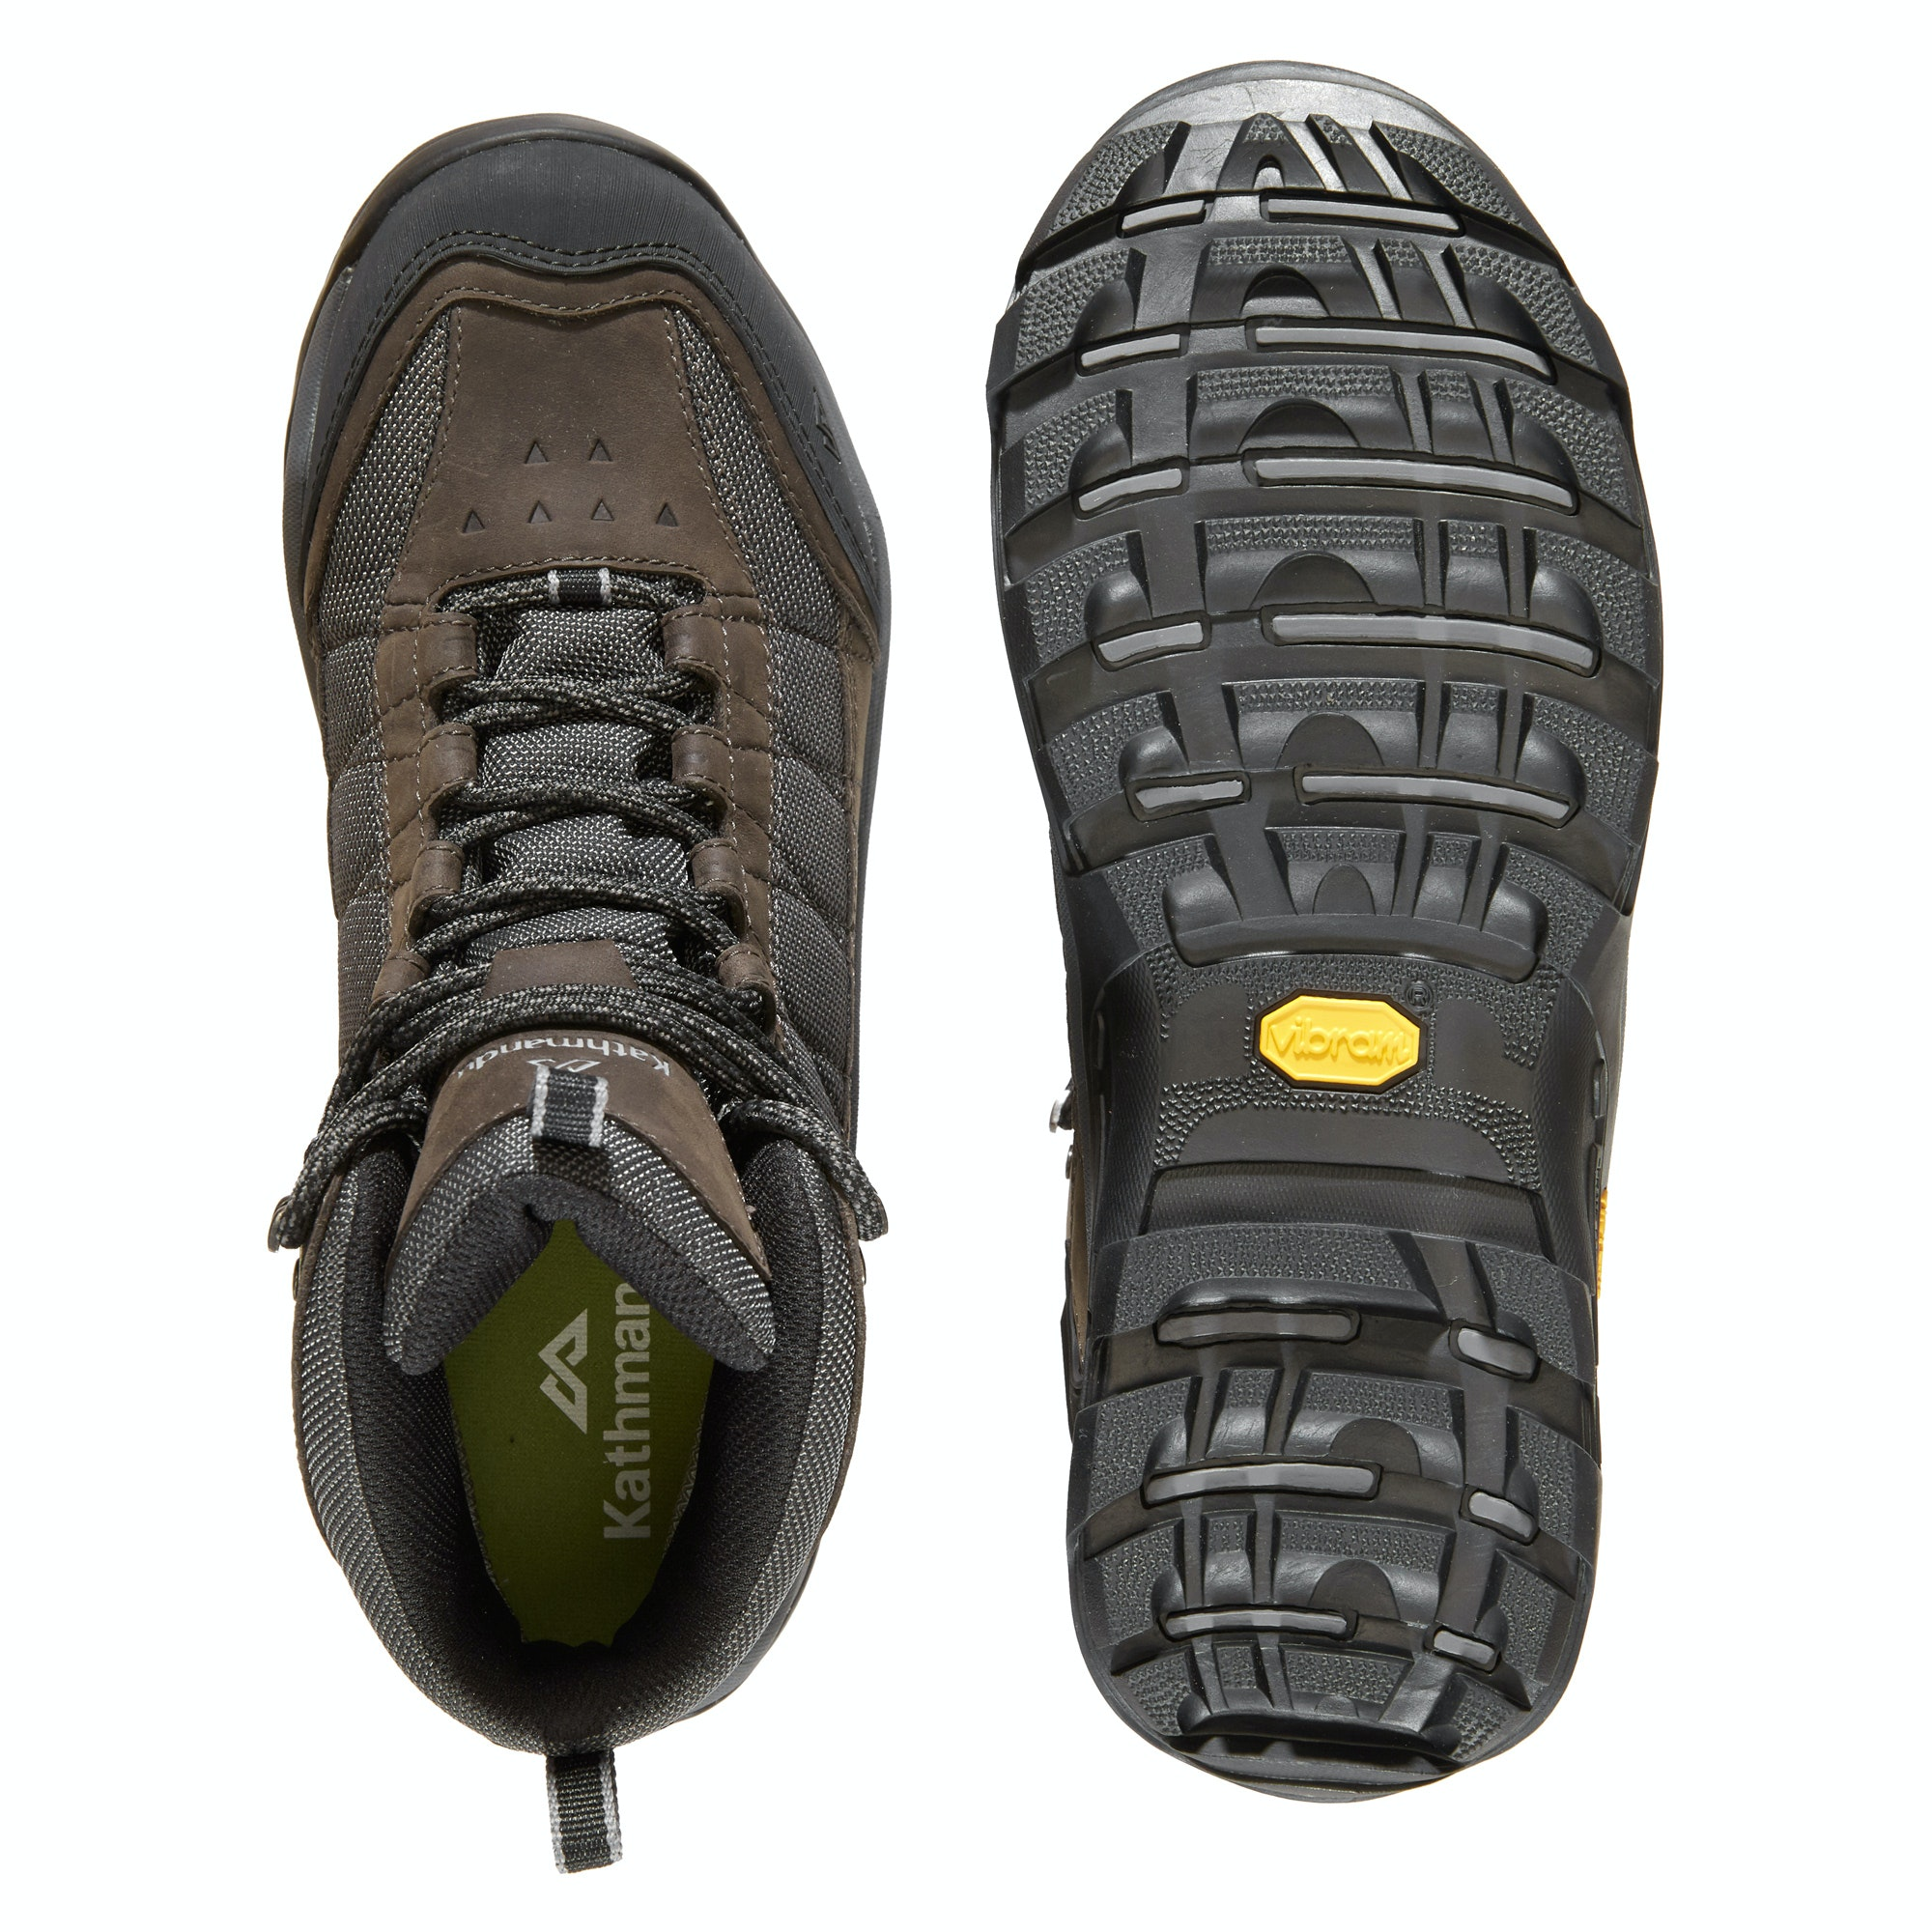 NEW-Kathmandu-Mornington-Mens-Vibram-Rubber-Waterproof-Lightweight-Hiking-Boots thumbnail 12